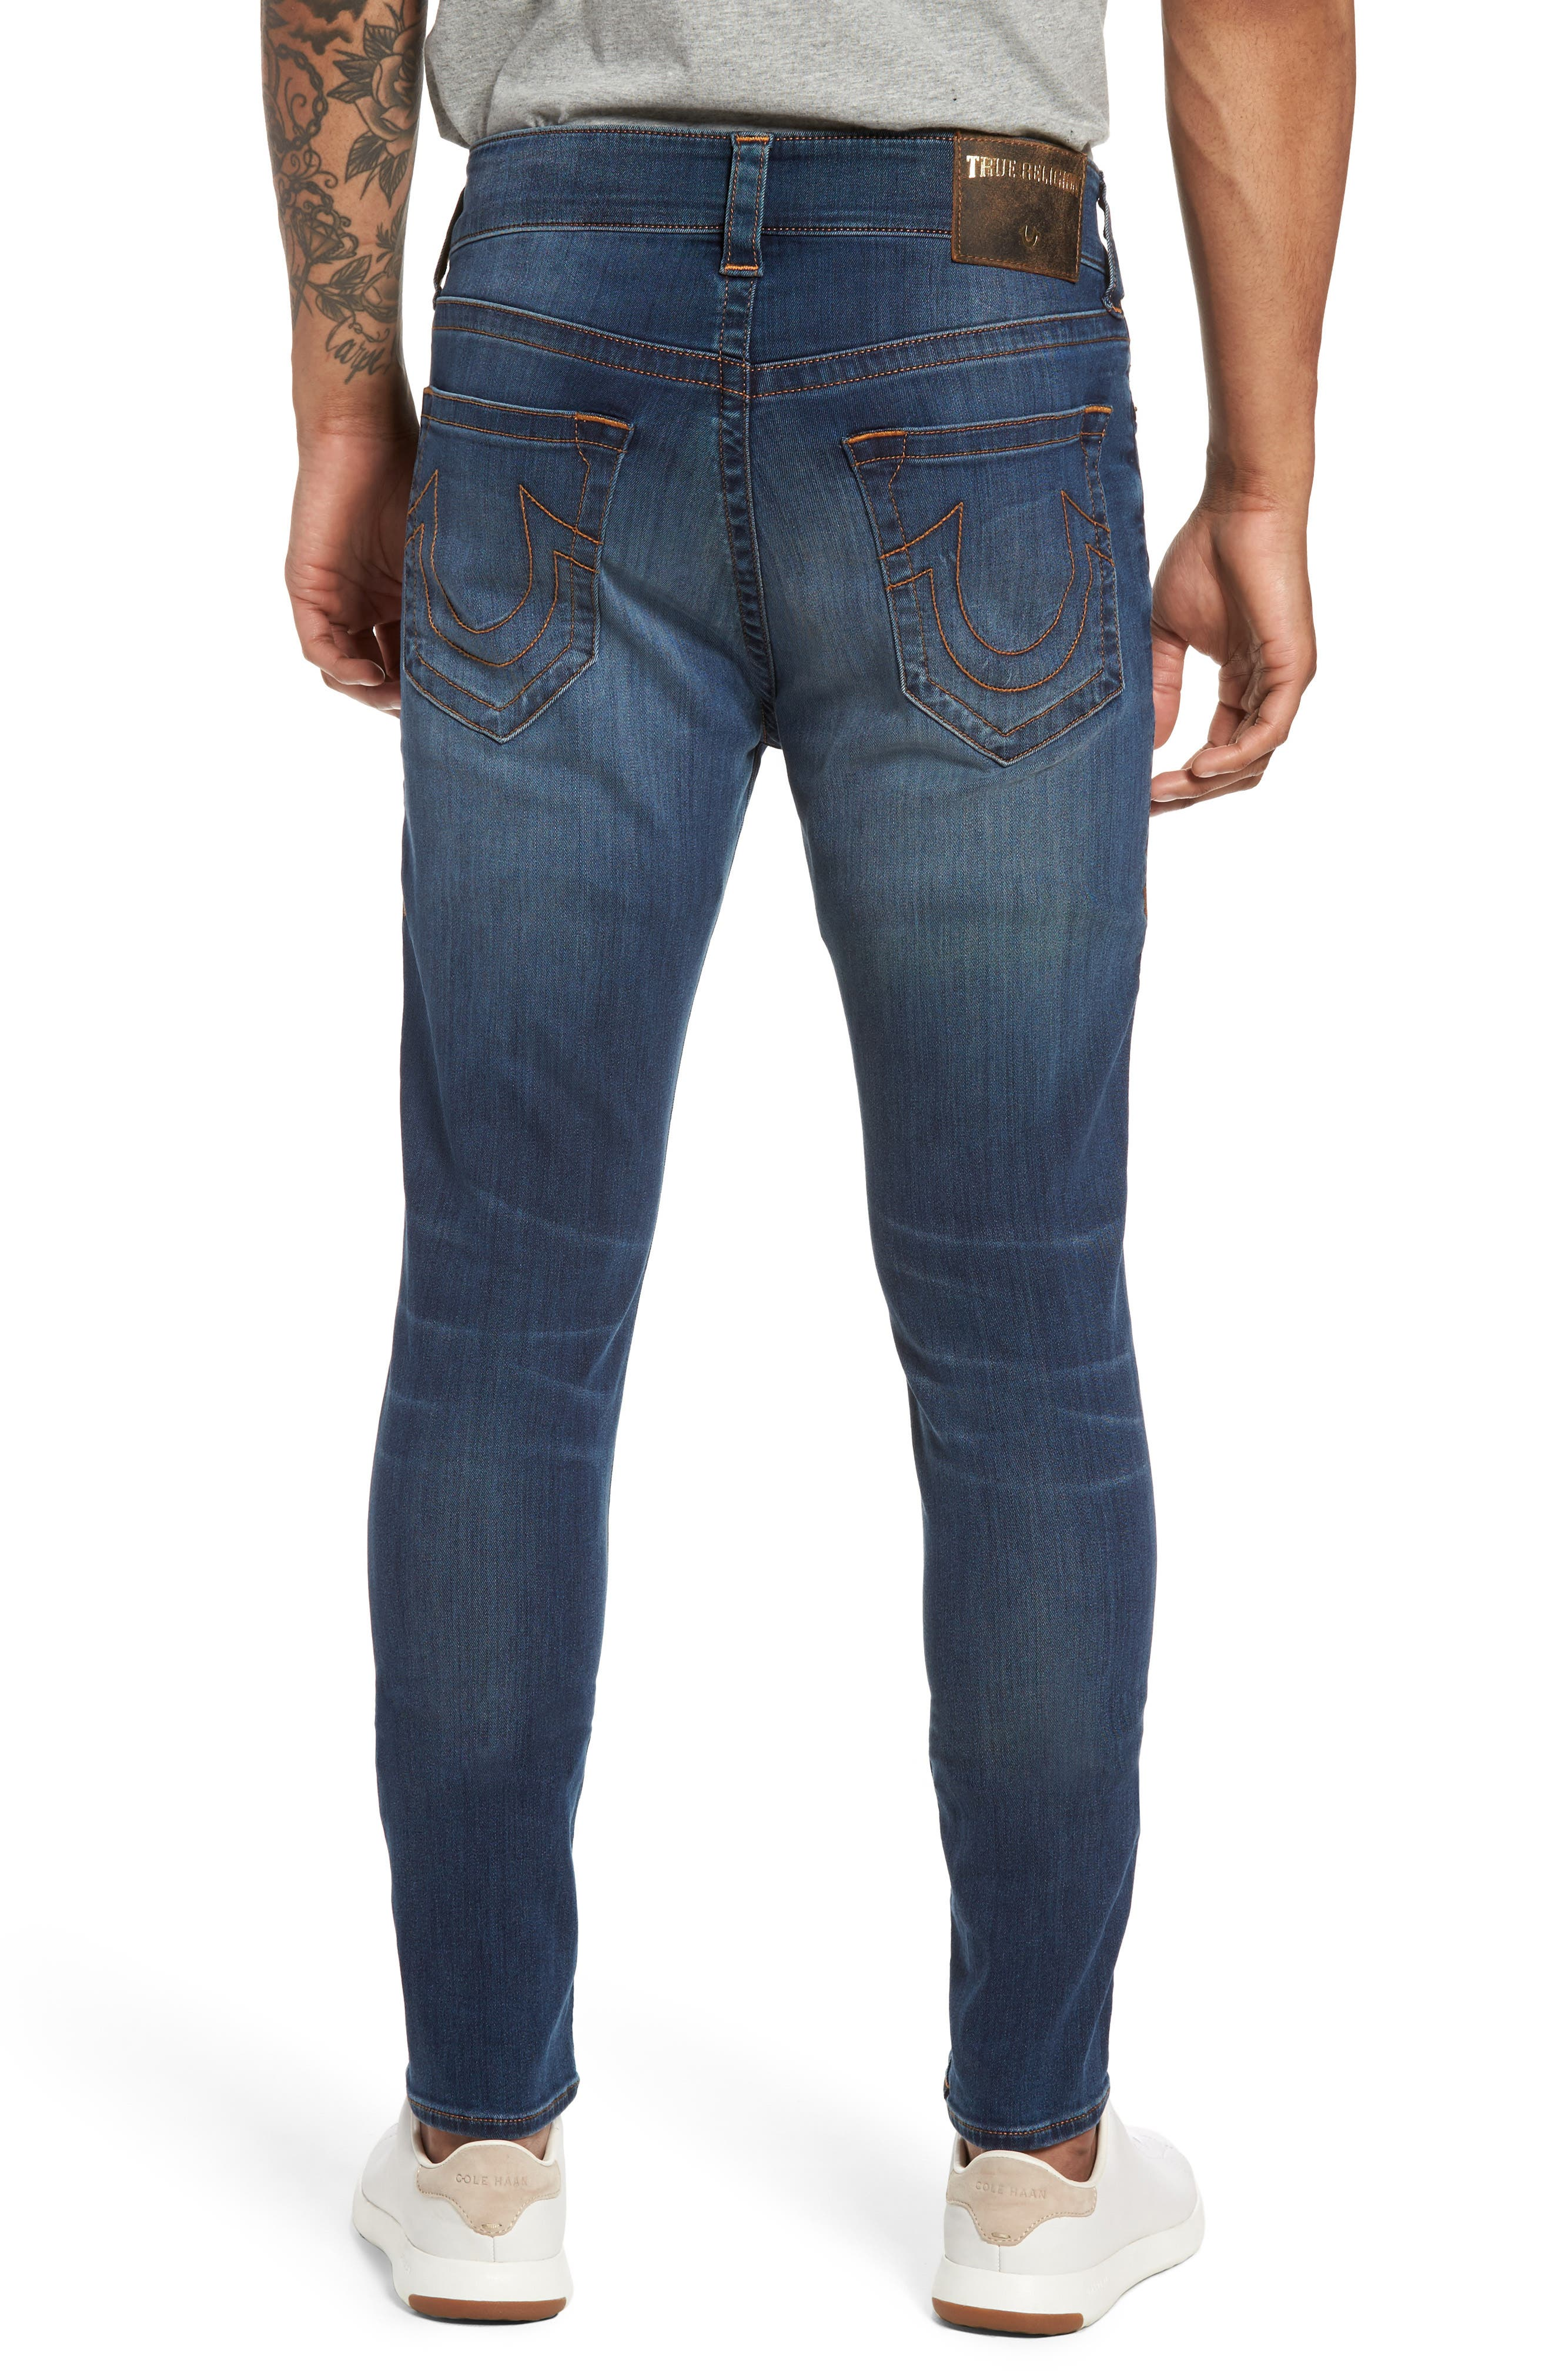 Alternate Image 2  - True Religion Brand Jeans Jack Skinny Fit Jeans (Desert Highway)